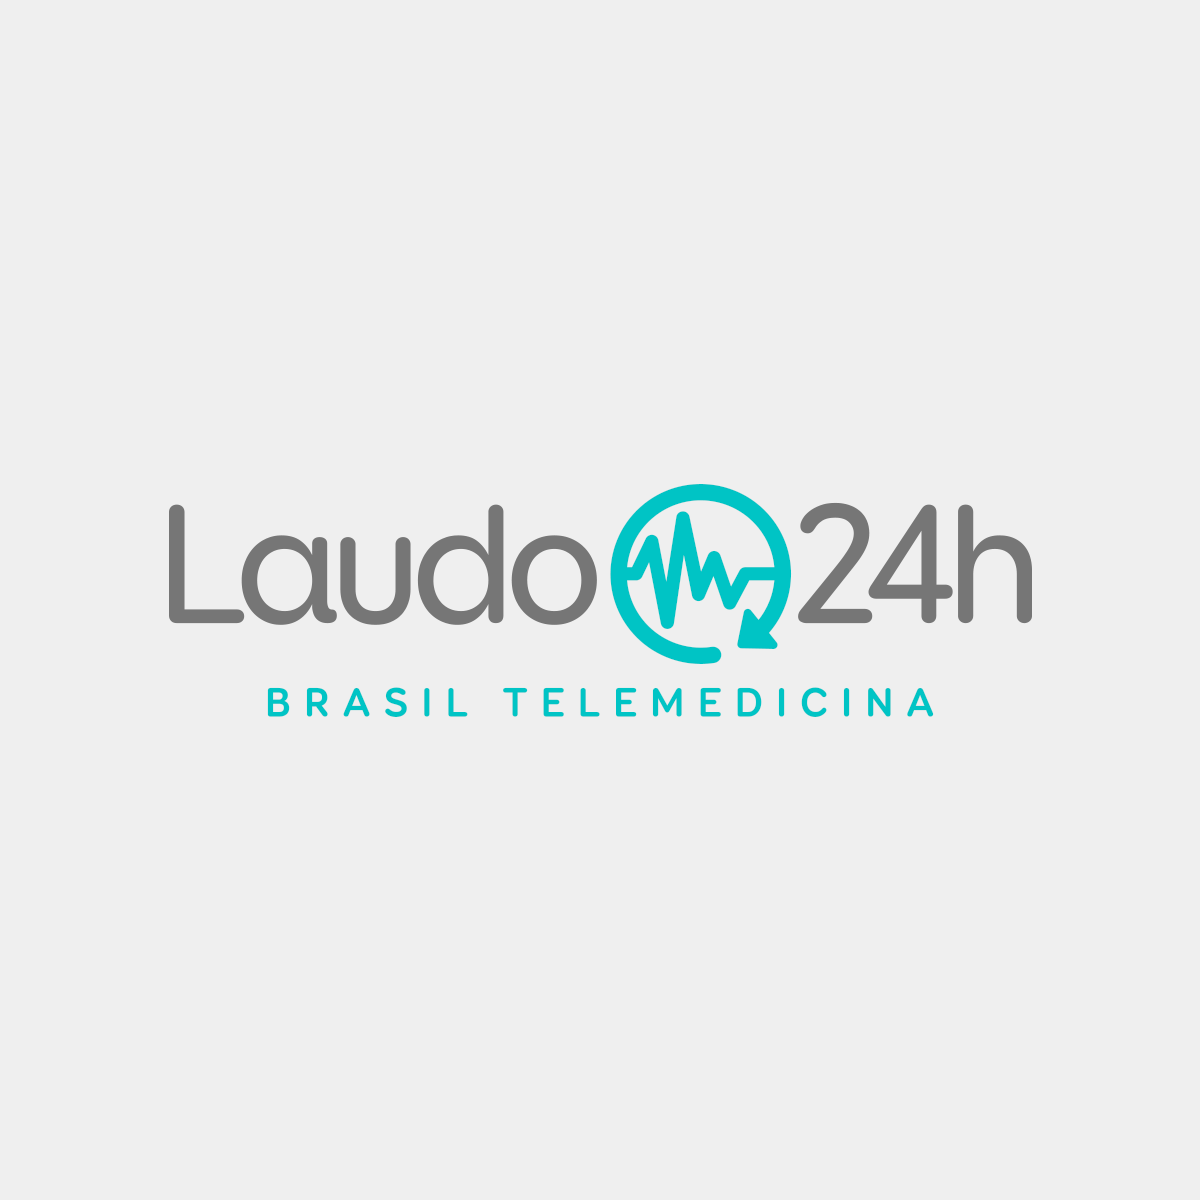 http://brasiltelemedicina.com.br/wp-content/uploads/2016/07/laudo-24hs-1200x1200.png